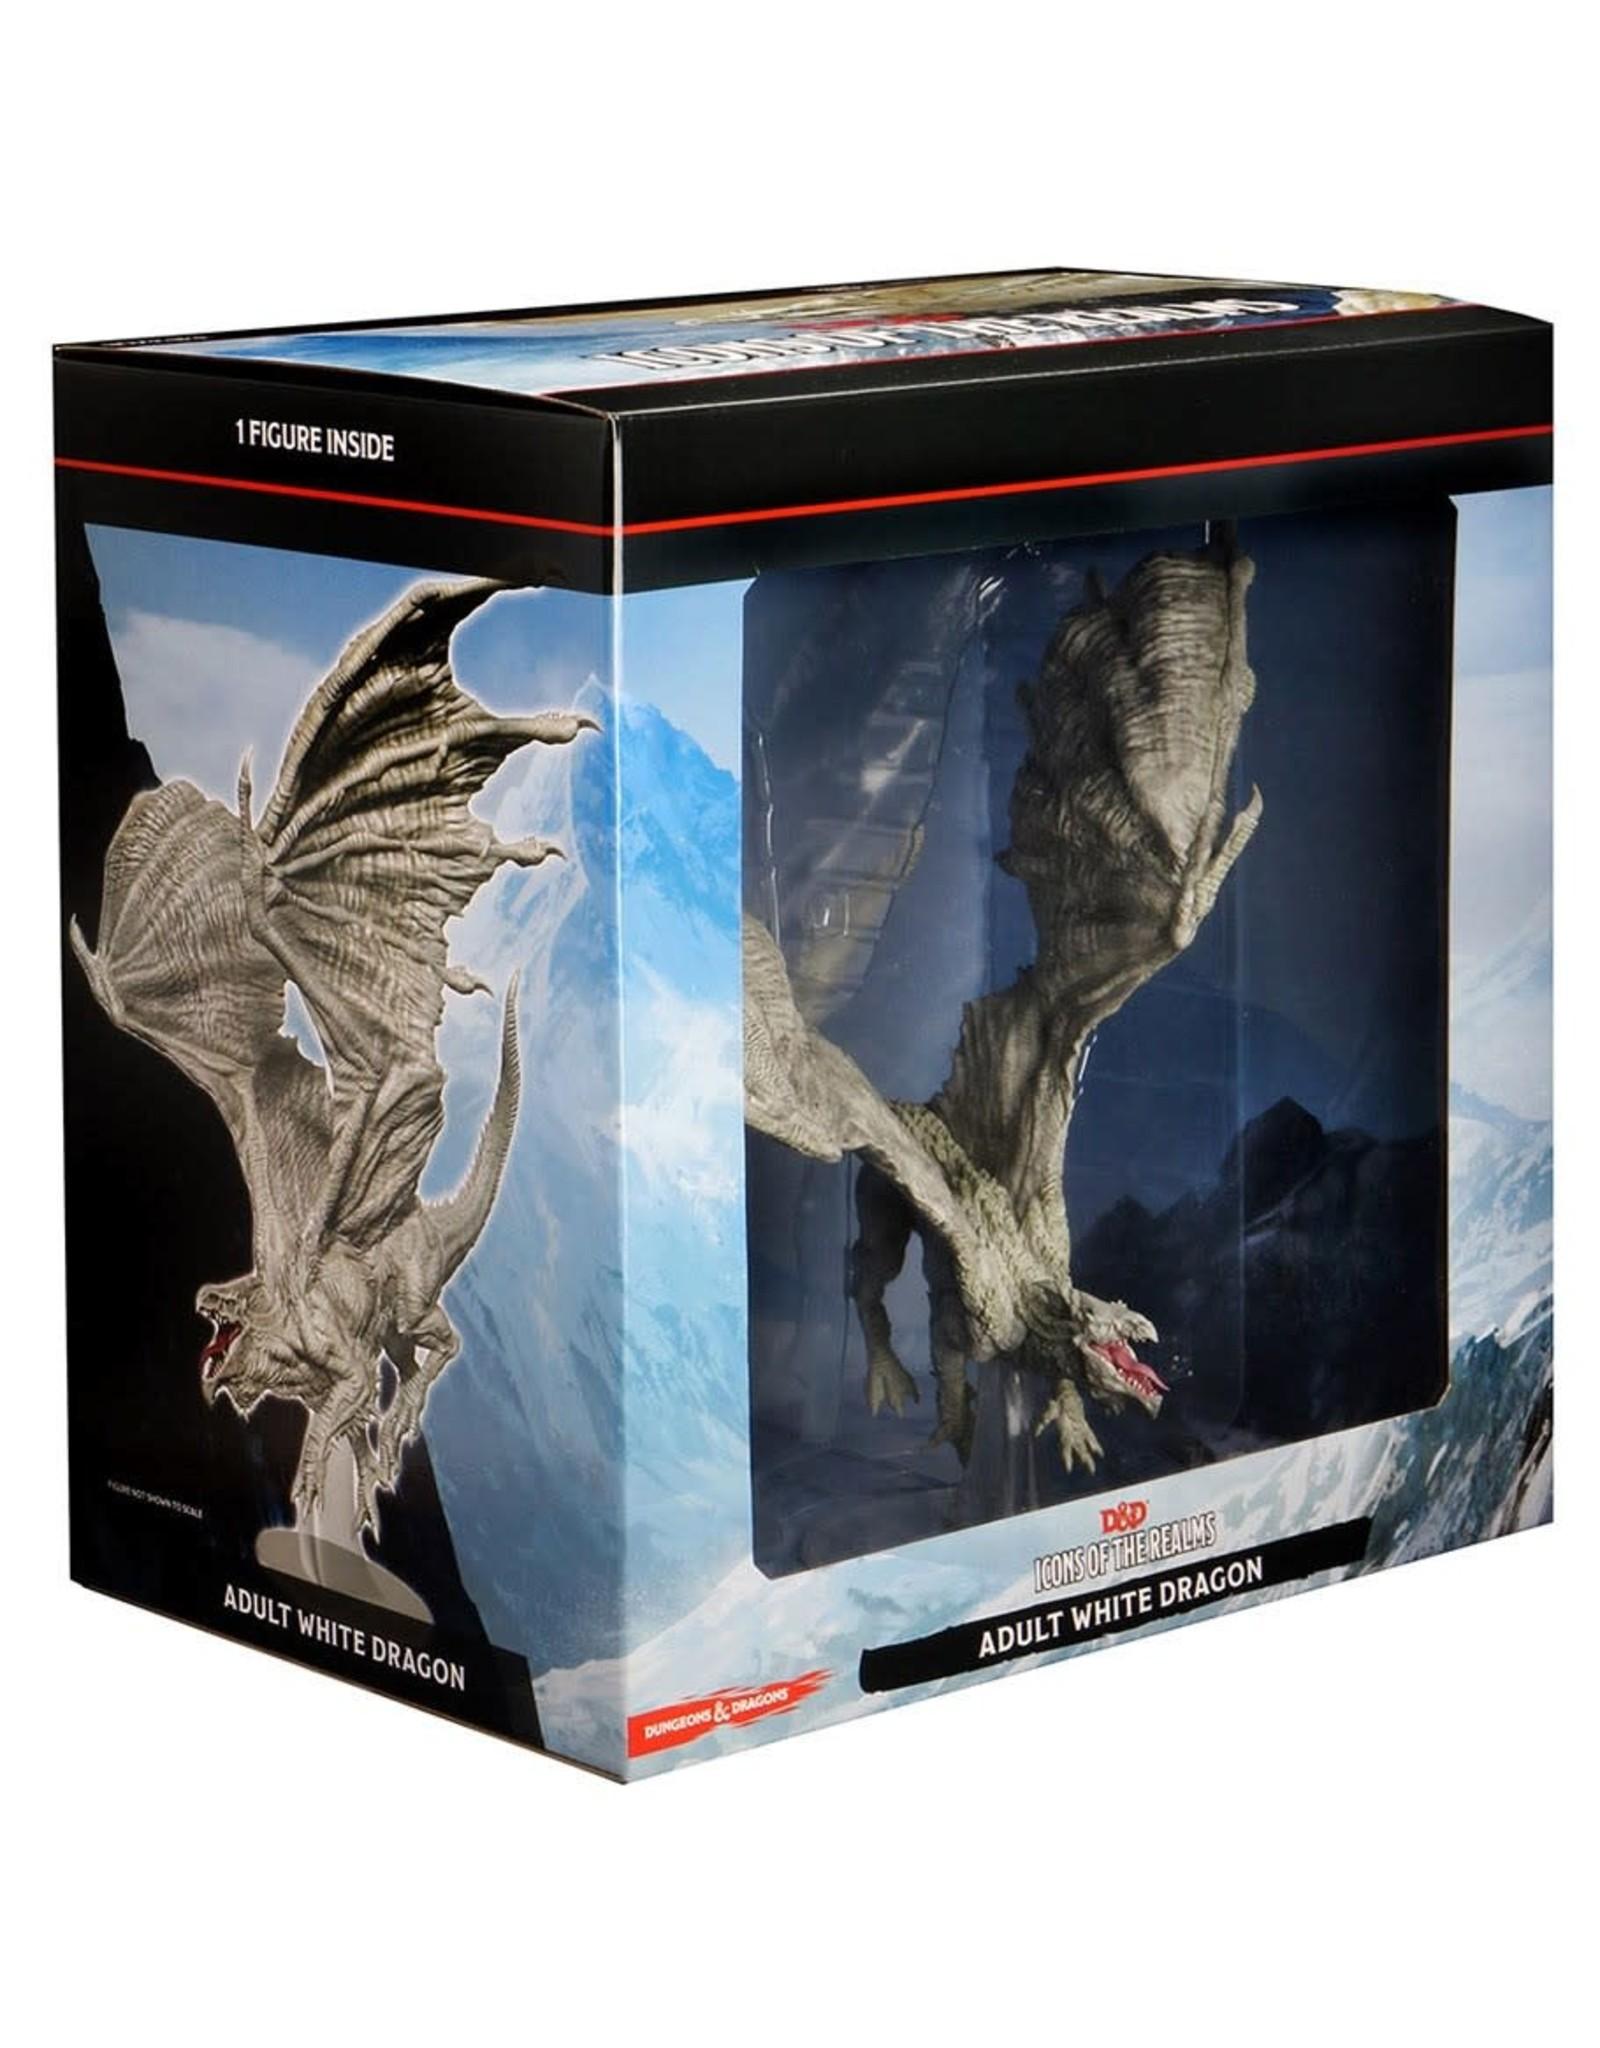 Wizkids D&D Minis: Adult White Dragon - Icons of the Realms Premium Figure